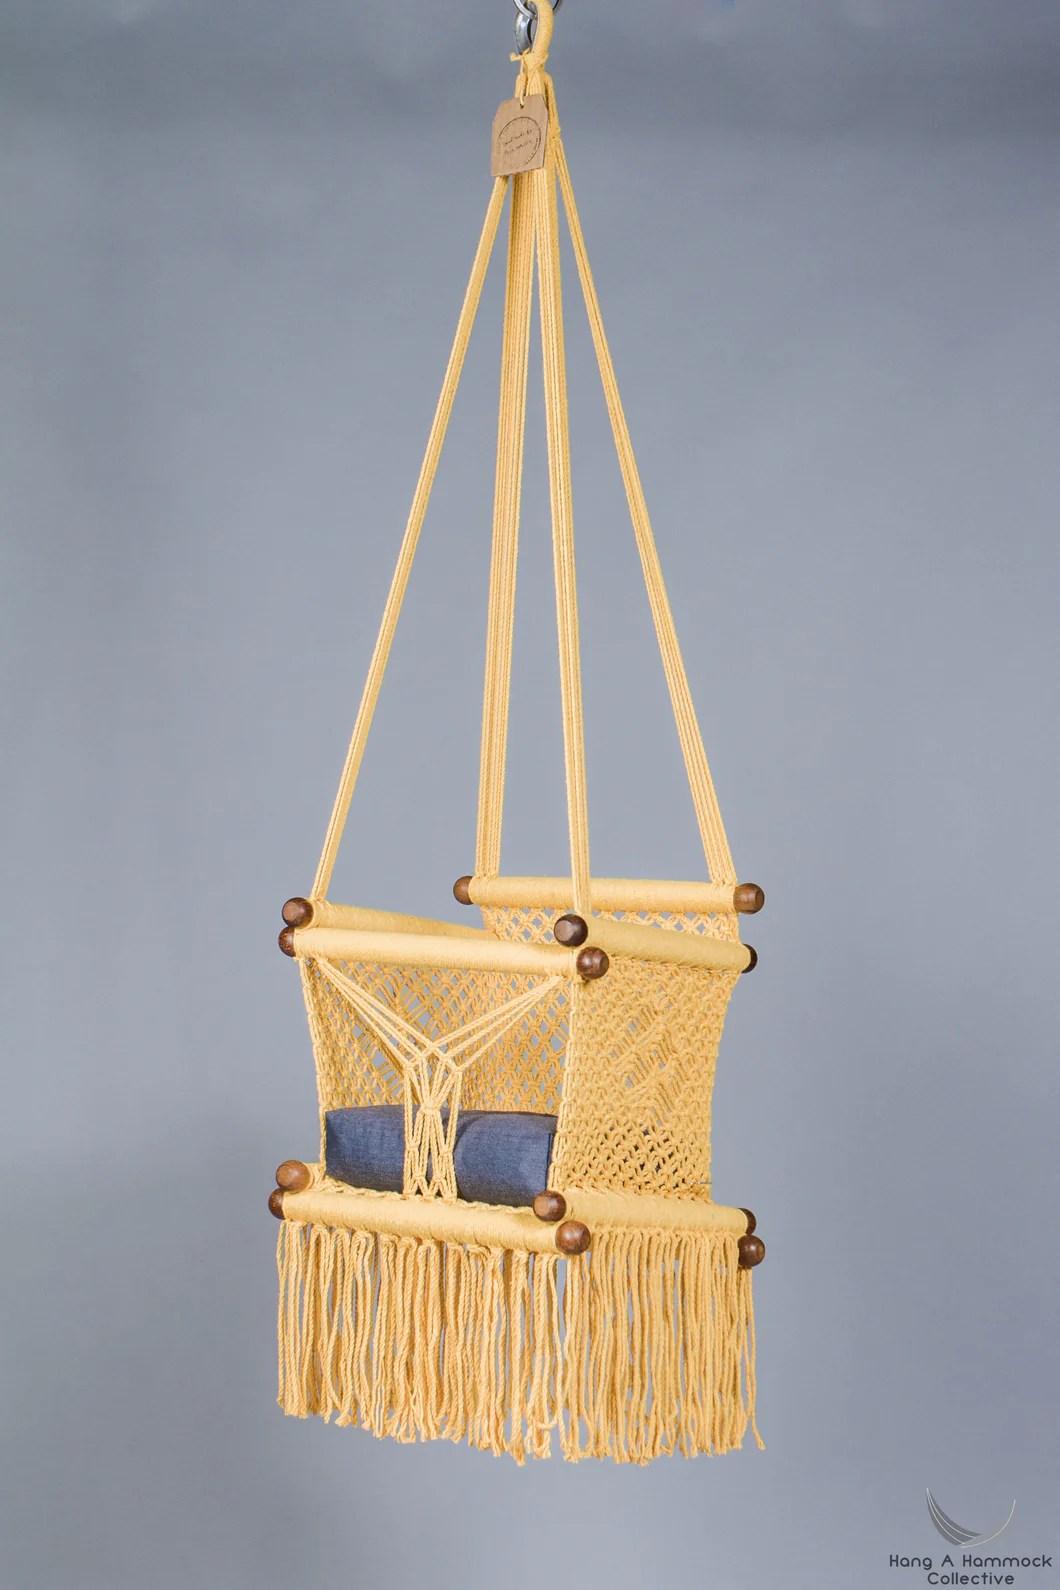 hanging chair for baby office johor bahru swing in macrame  hangahammockcollective